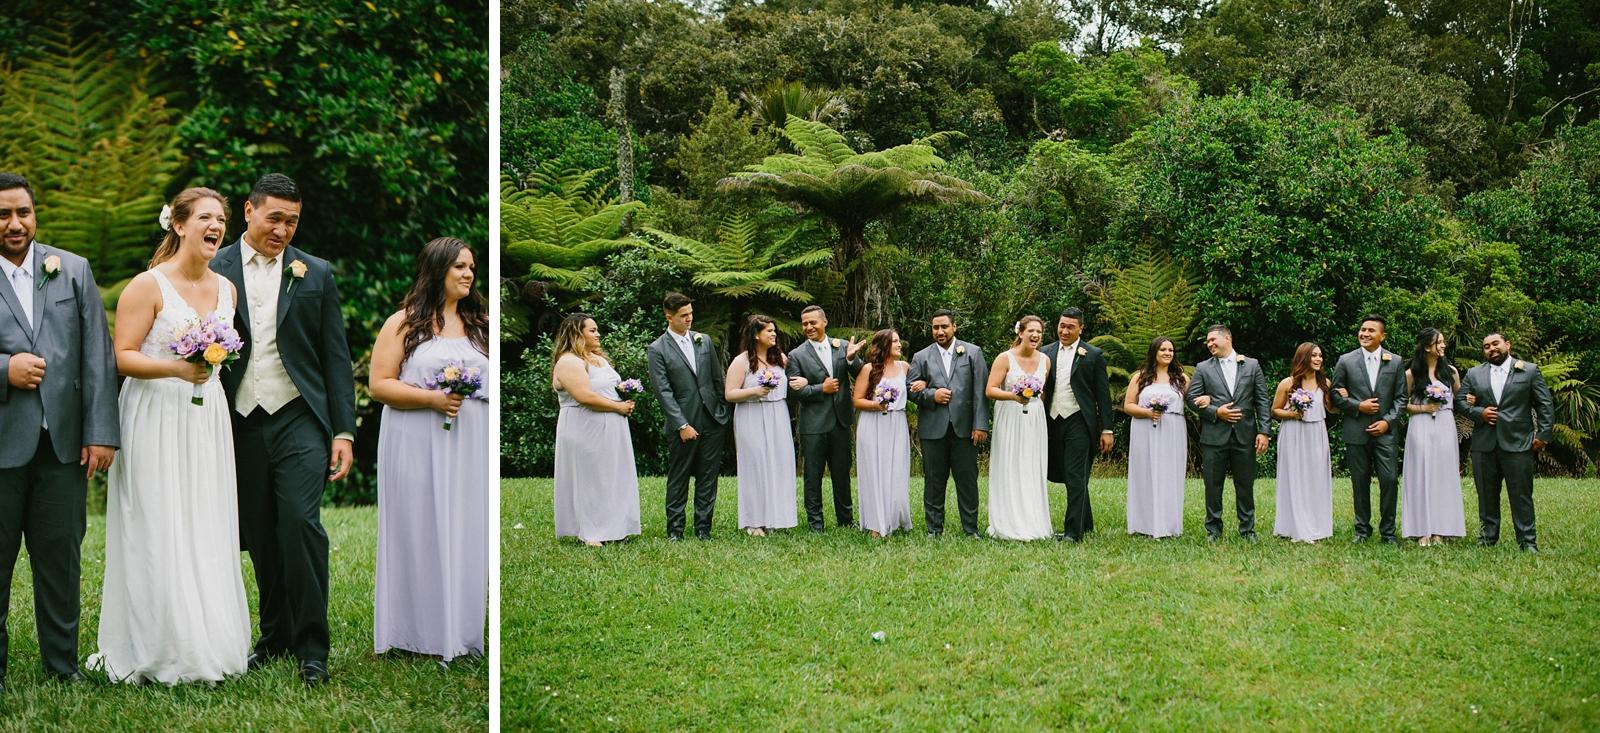 GabbyFiti_Auckland Wedding Photographer_Patty Lagera_0043.jpg